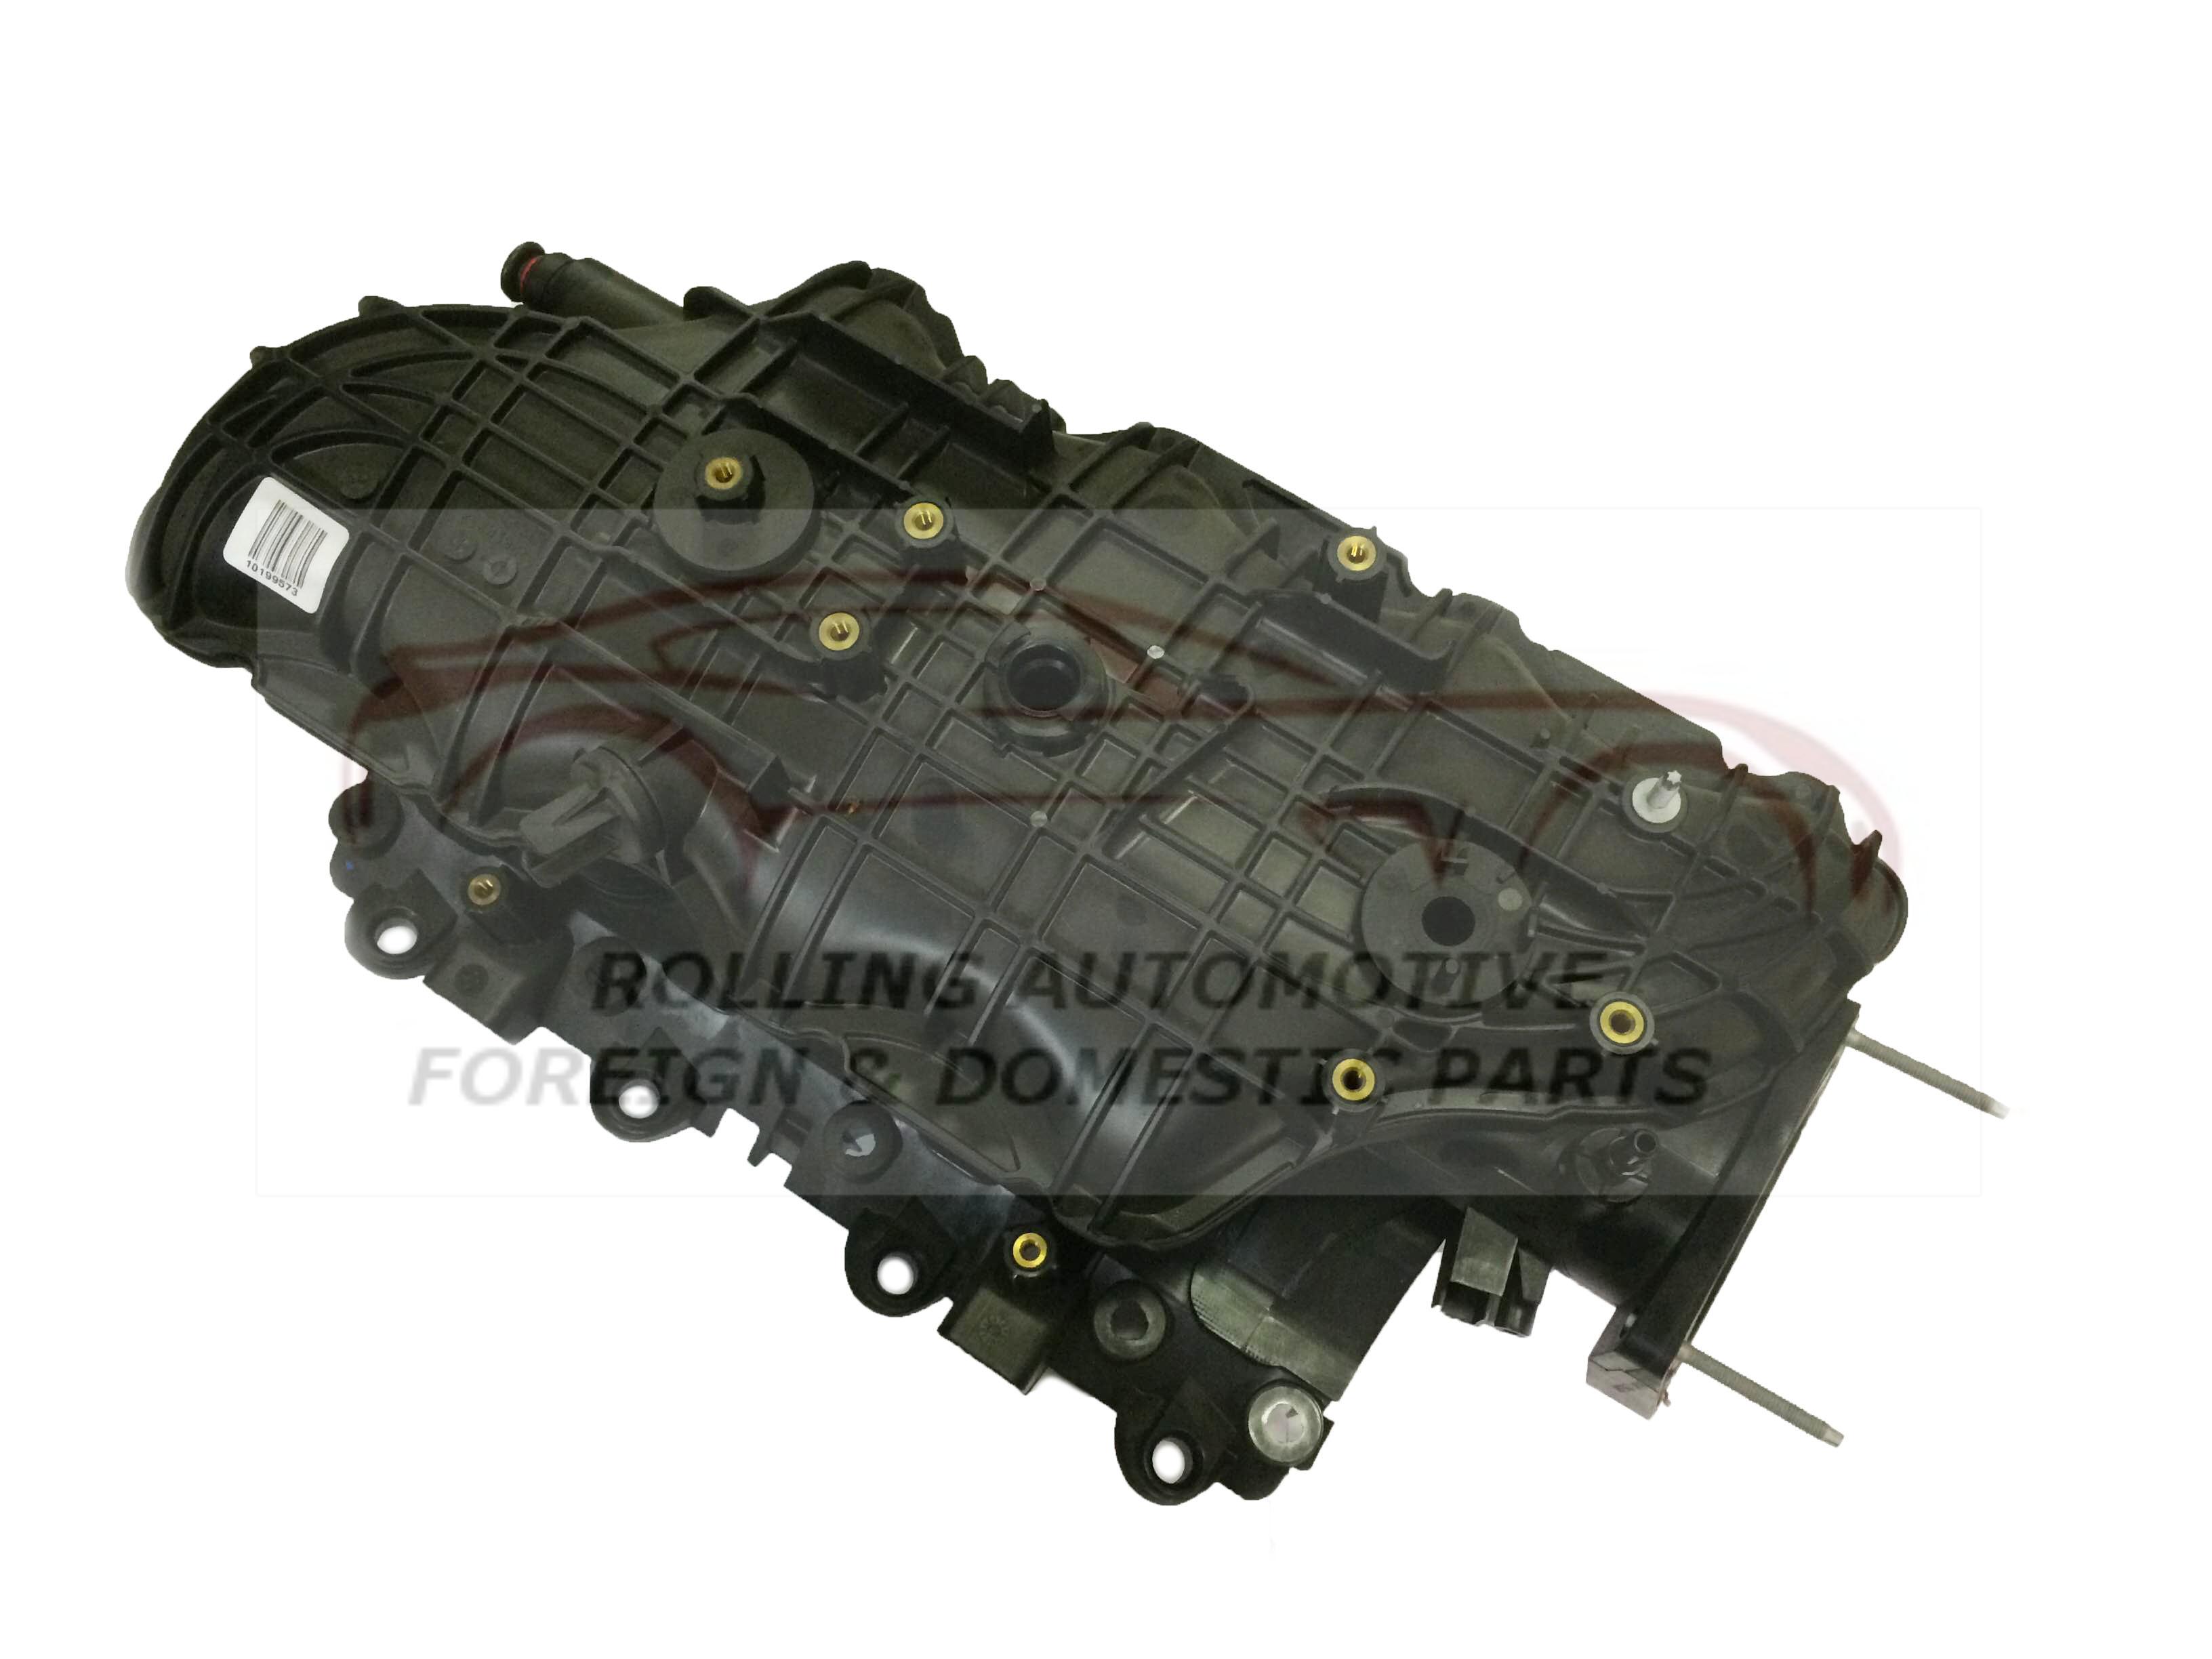 2007 2008 2009 2010 2011 2012 2013 2014 4 8l 5 3l Chevrolet Tahoe Suburban 4 8 5 3 Intake